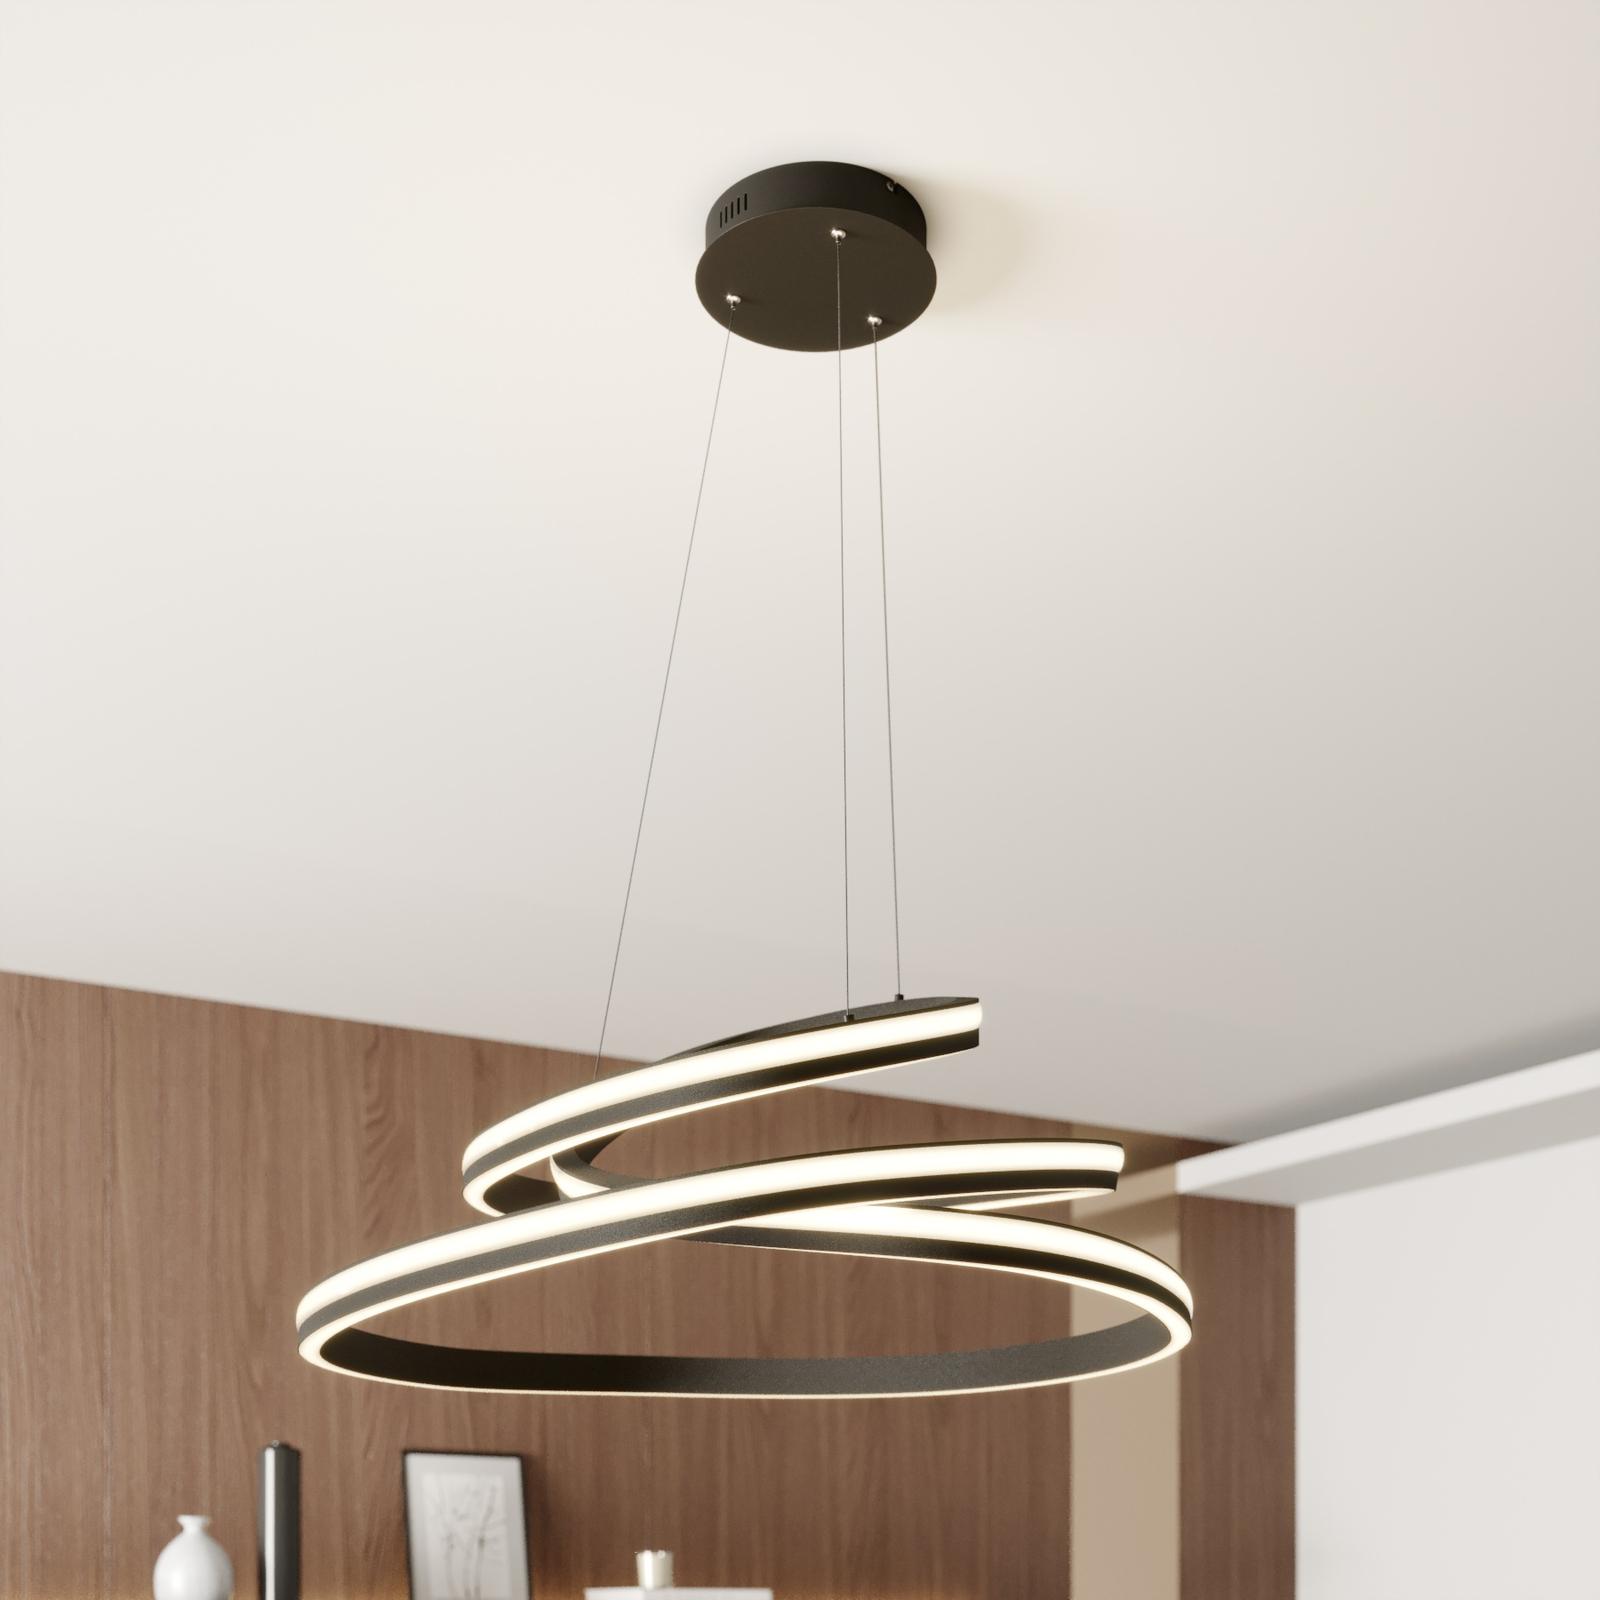 Lucande Emlyn -LED-riippuvalaisin, 80 cm